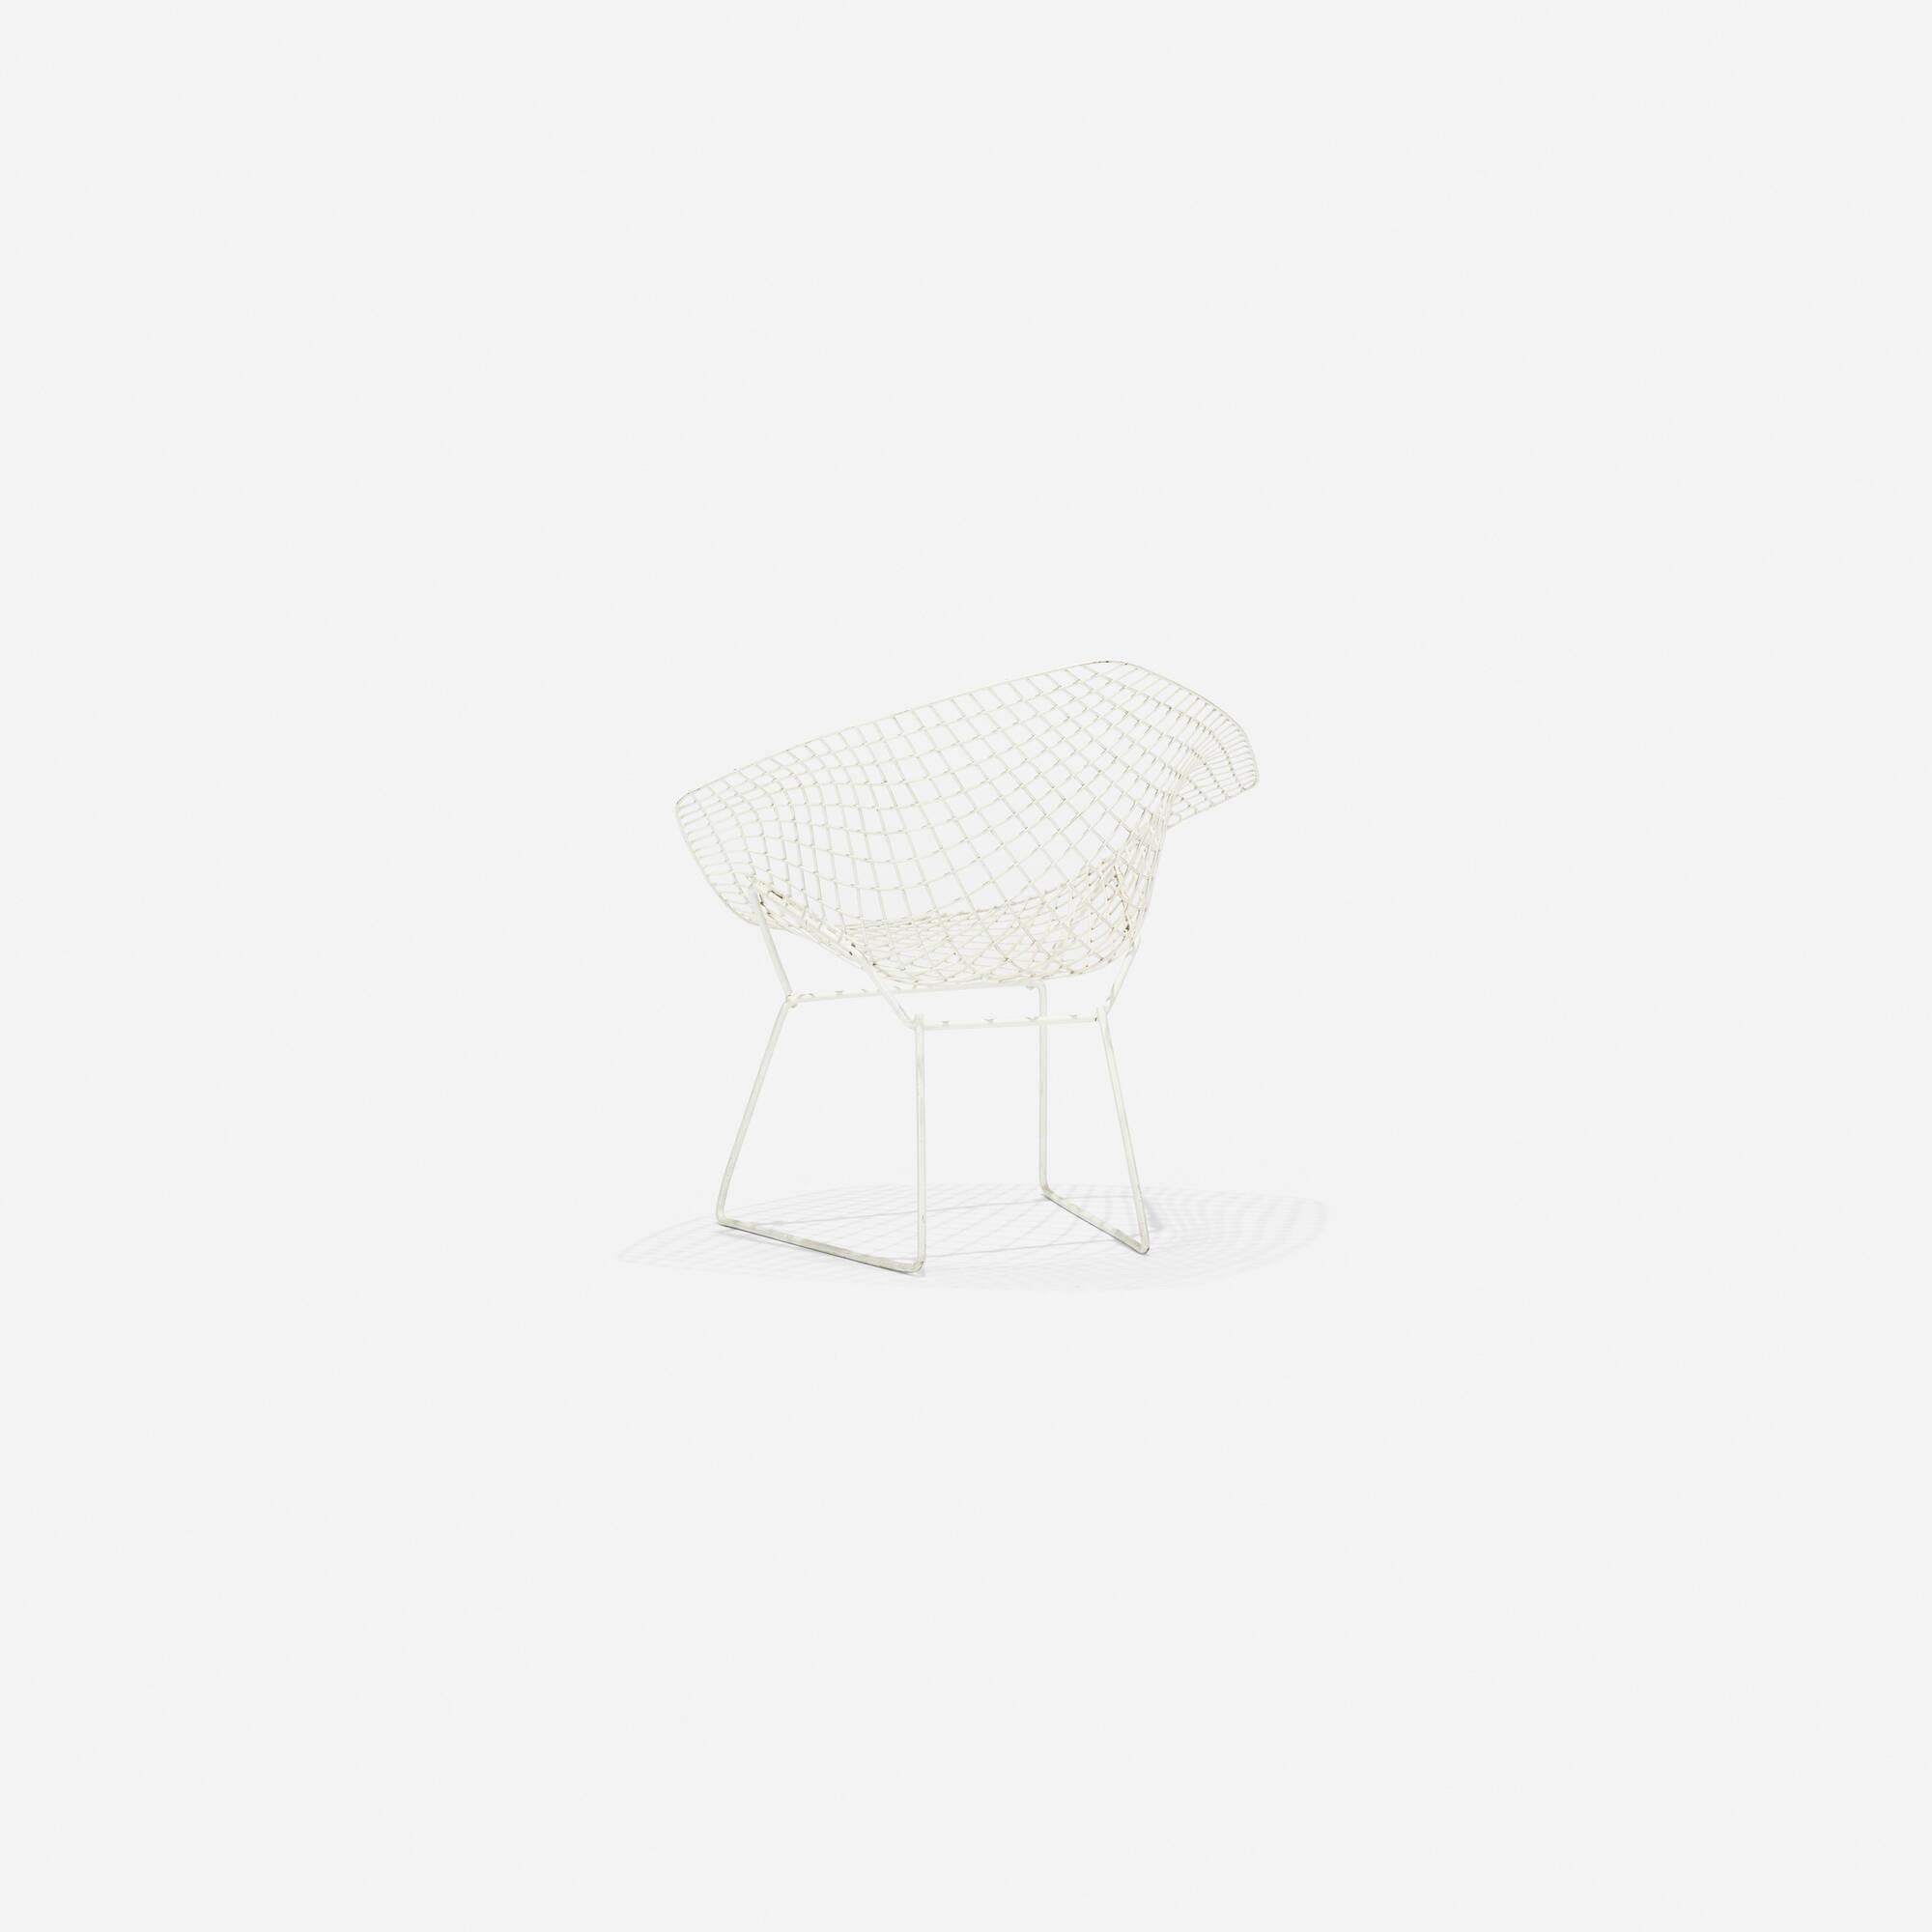 231: Harry Bertoia / Small Diamond chair \u003c Taxonomy of Design ...